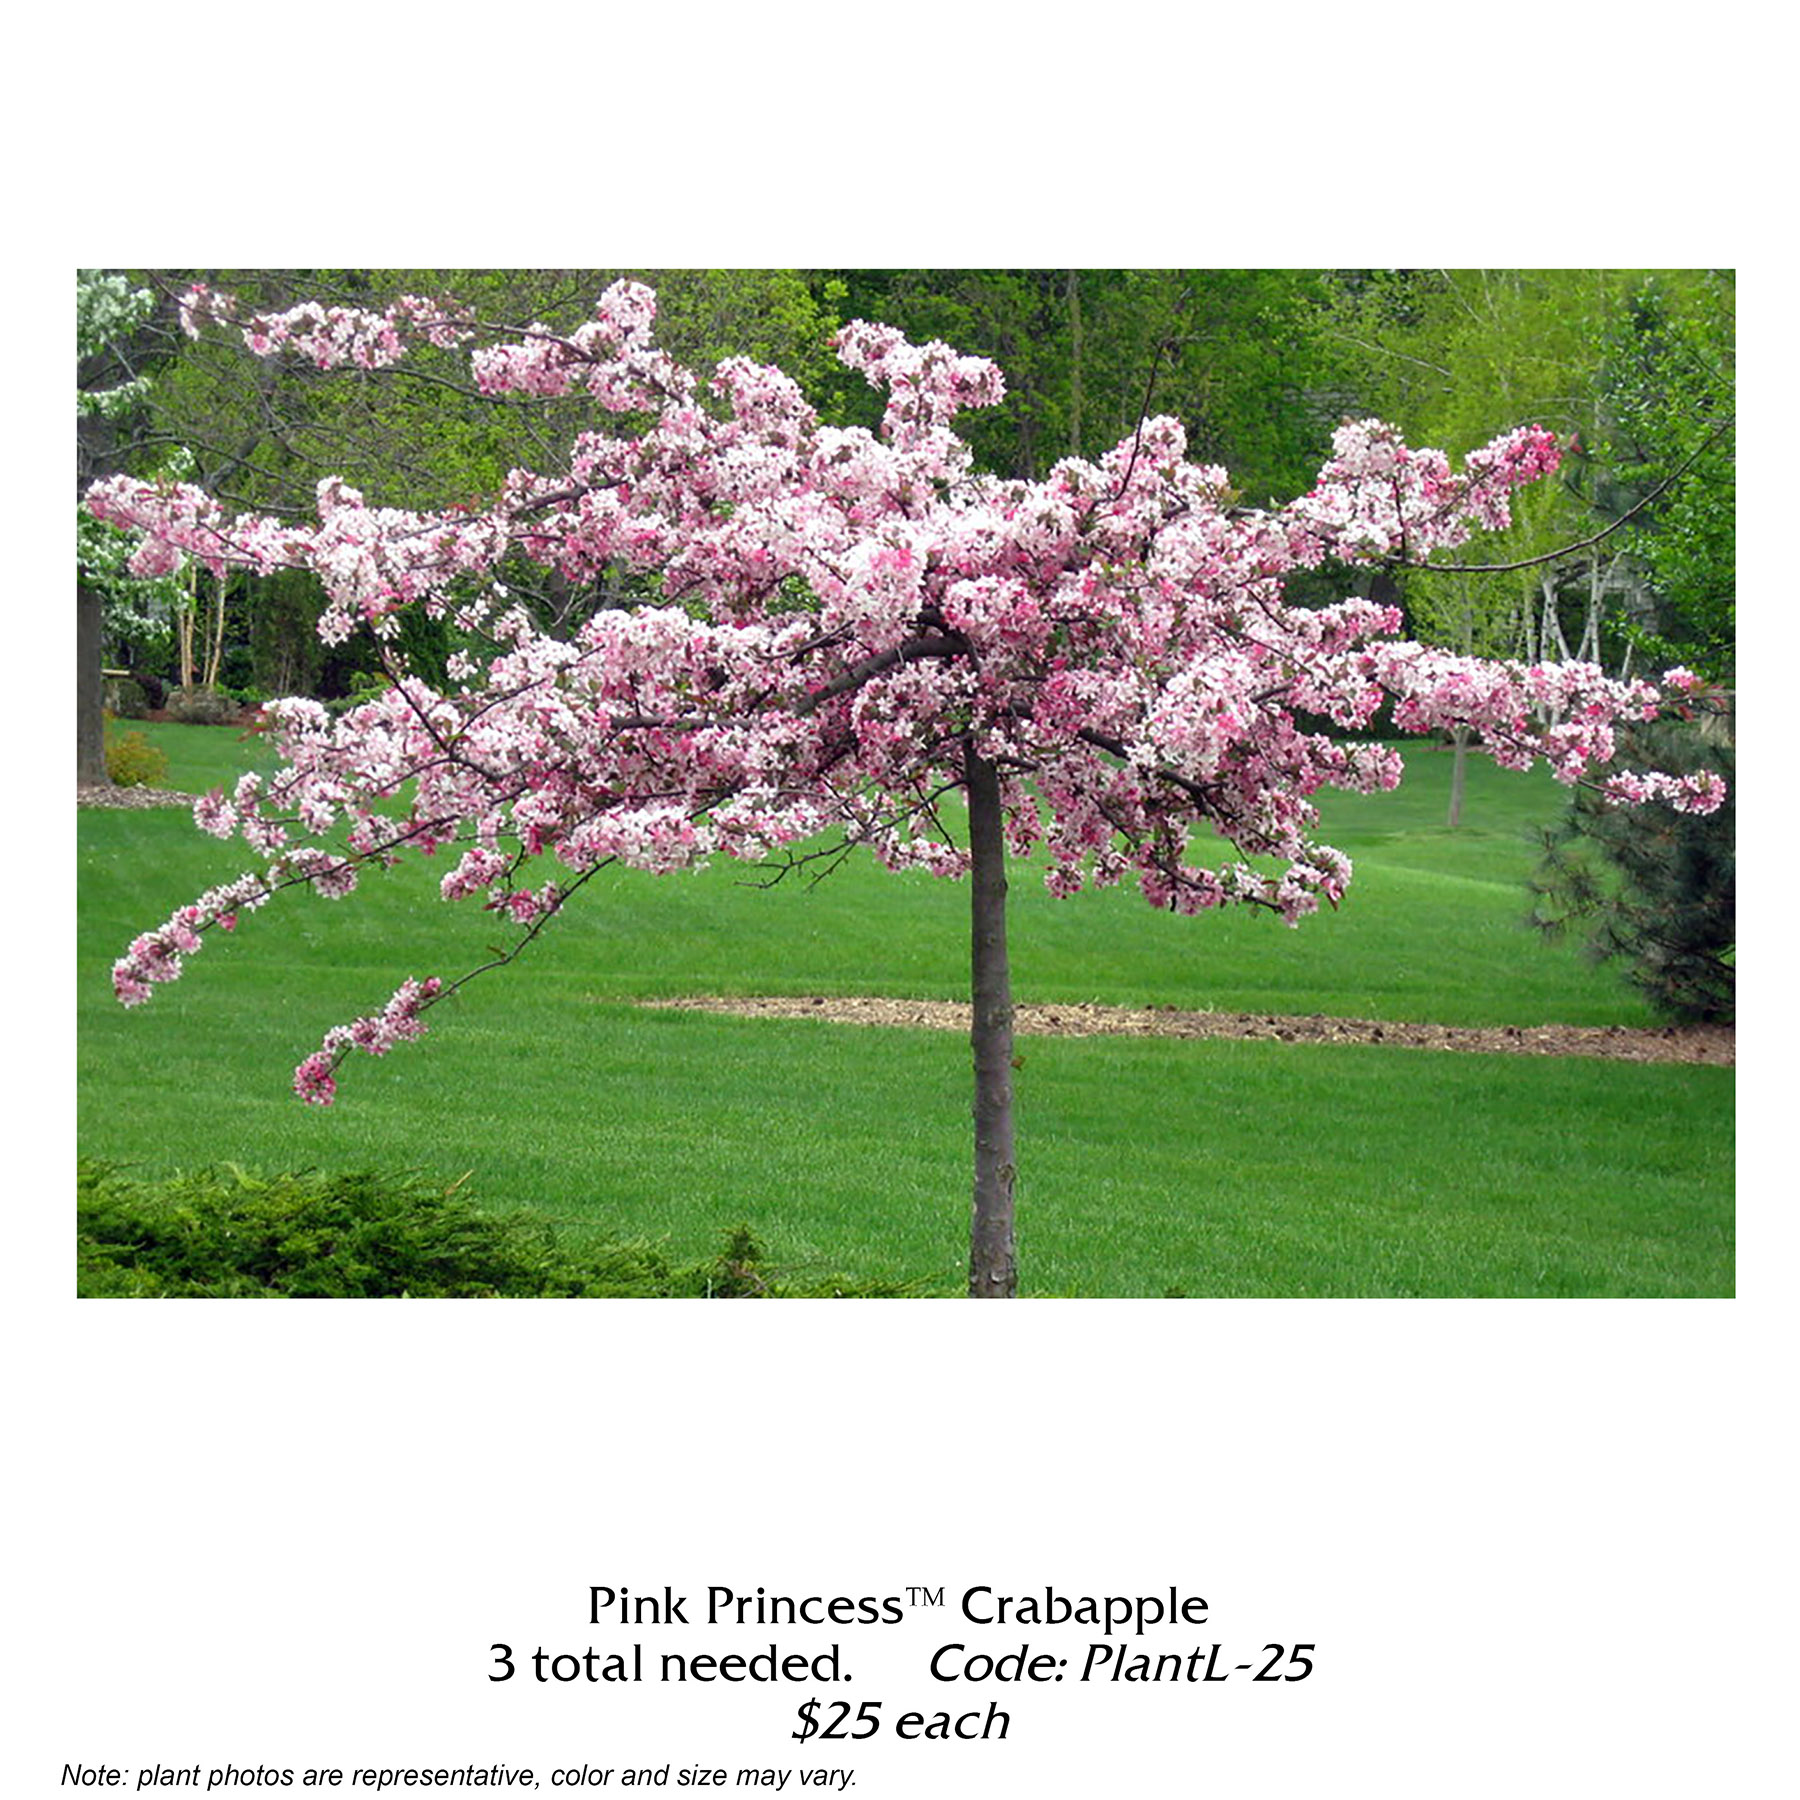 Pink princess crabapple tree.jpg